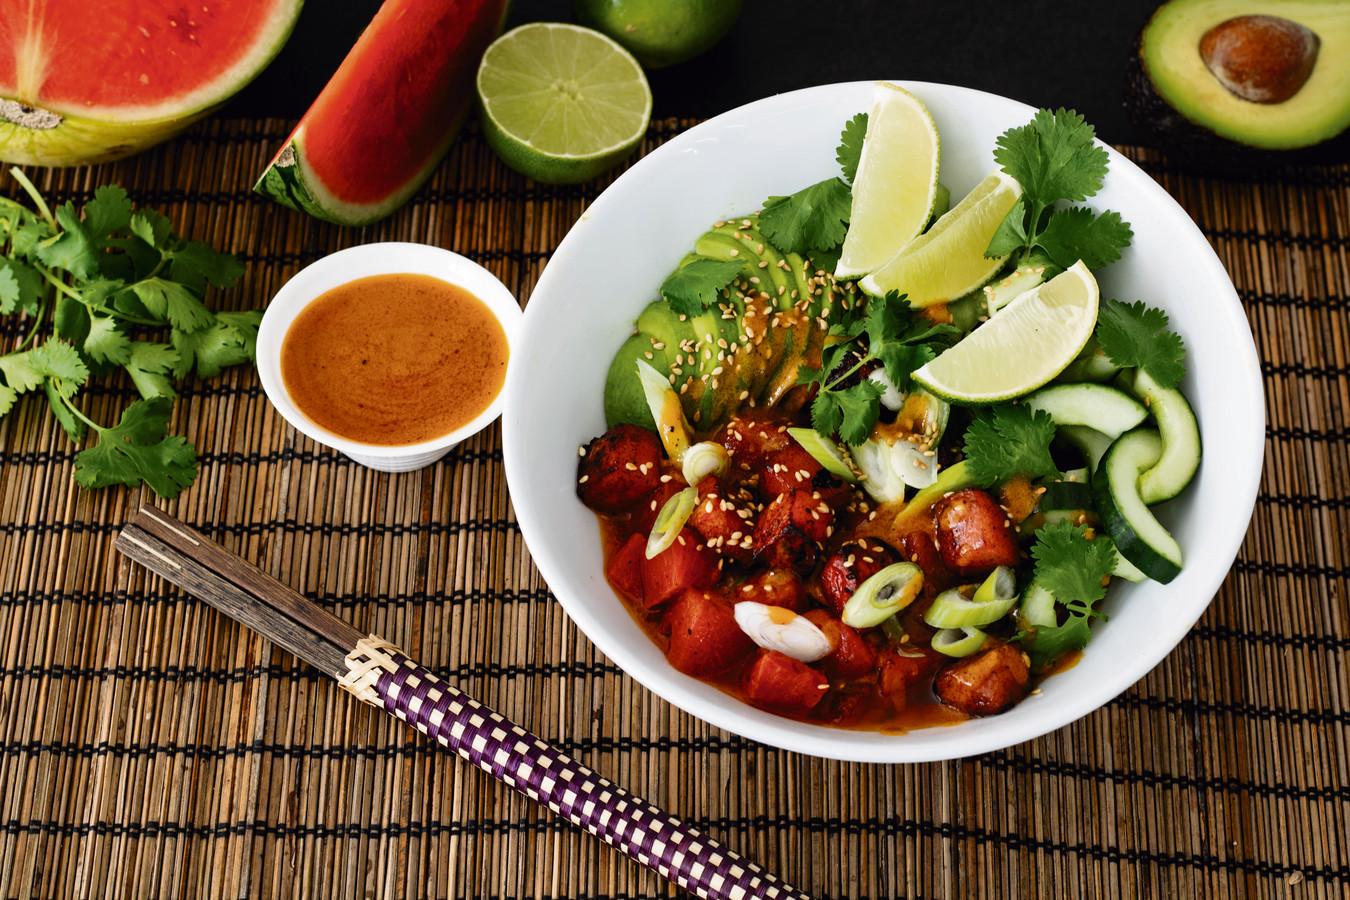 Watermeloen-poké bowl met avocado en komkommer